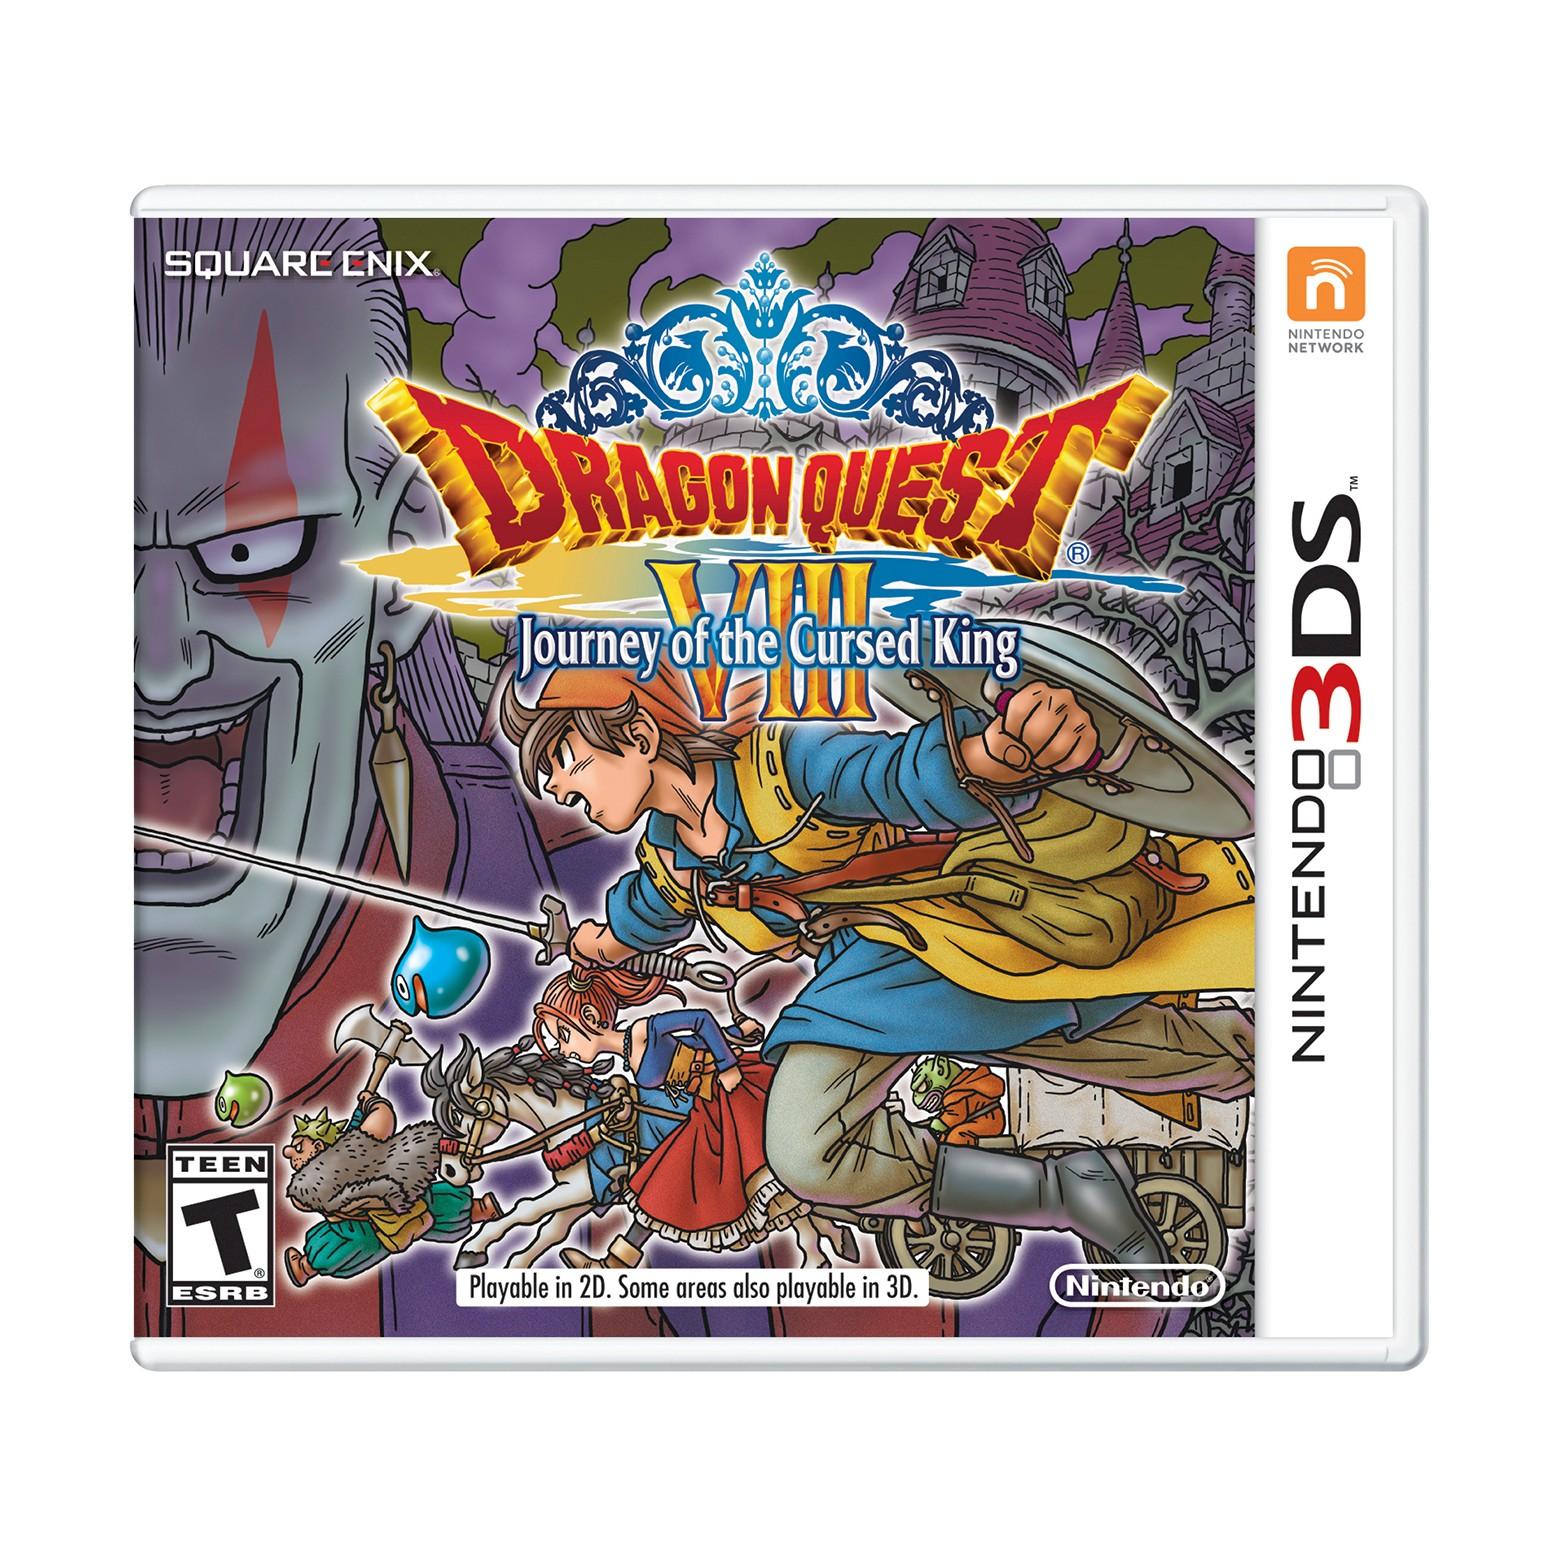 Target B&M Clearance: Nintendo 3DS Dragon Quest VIII  $12